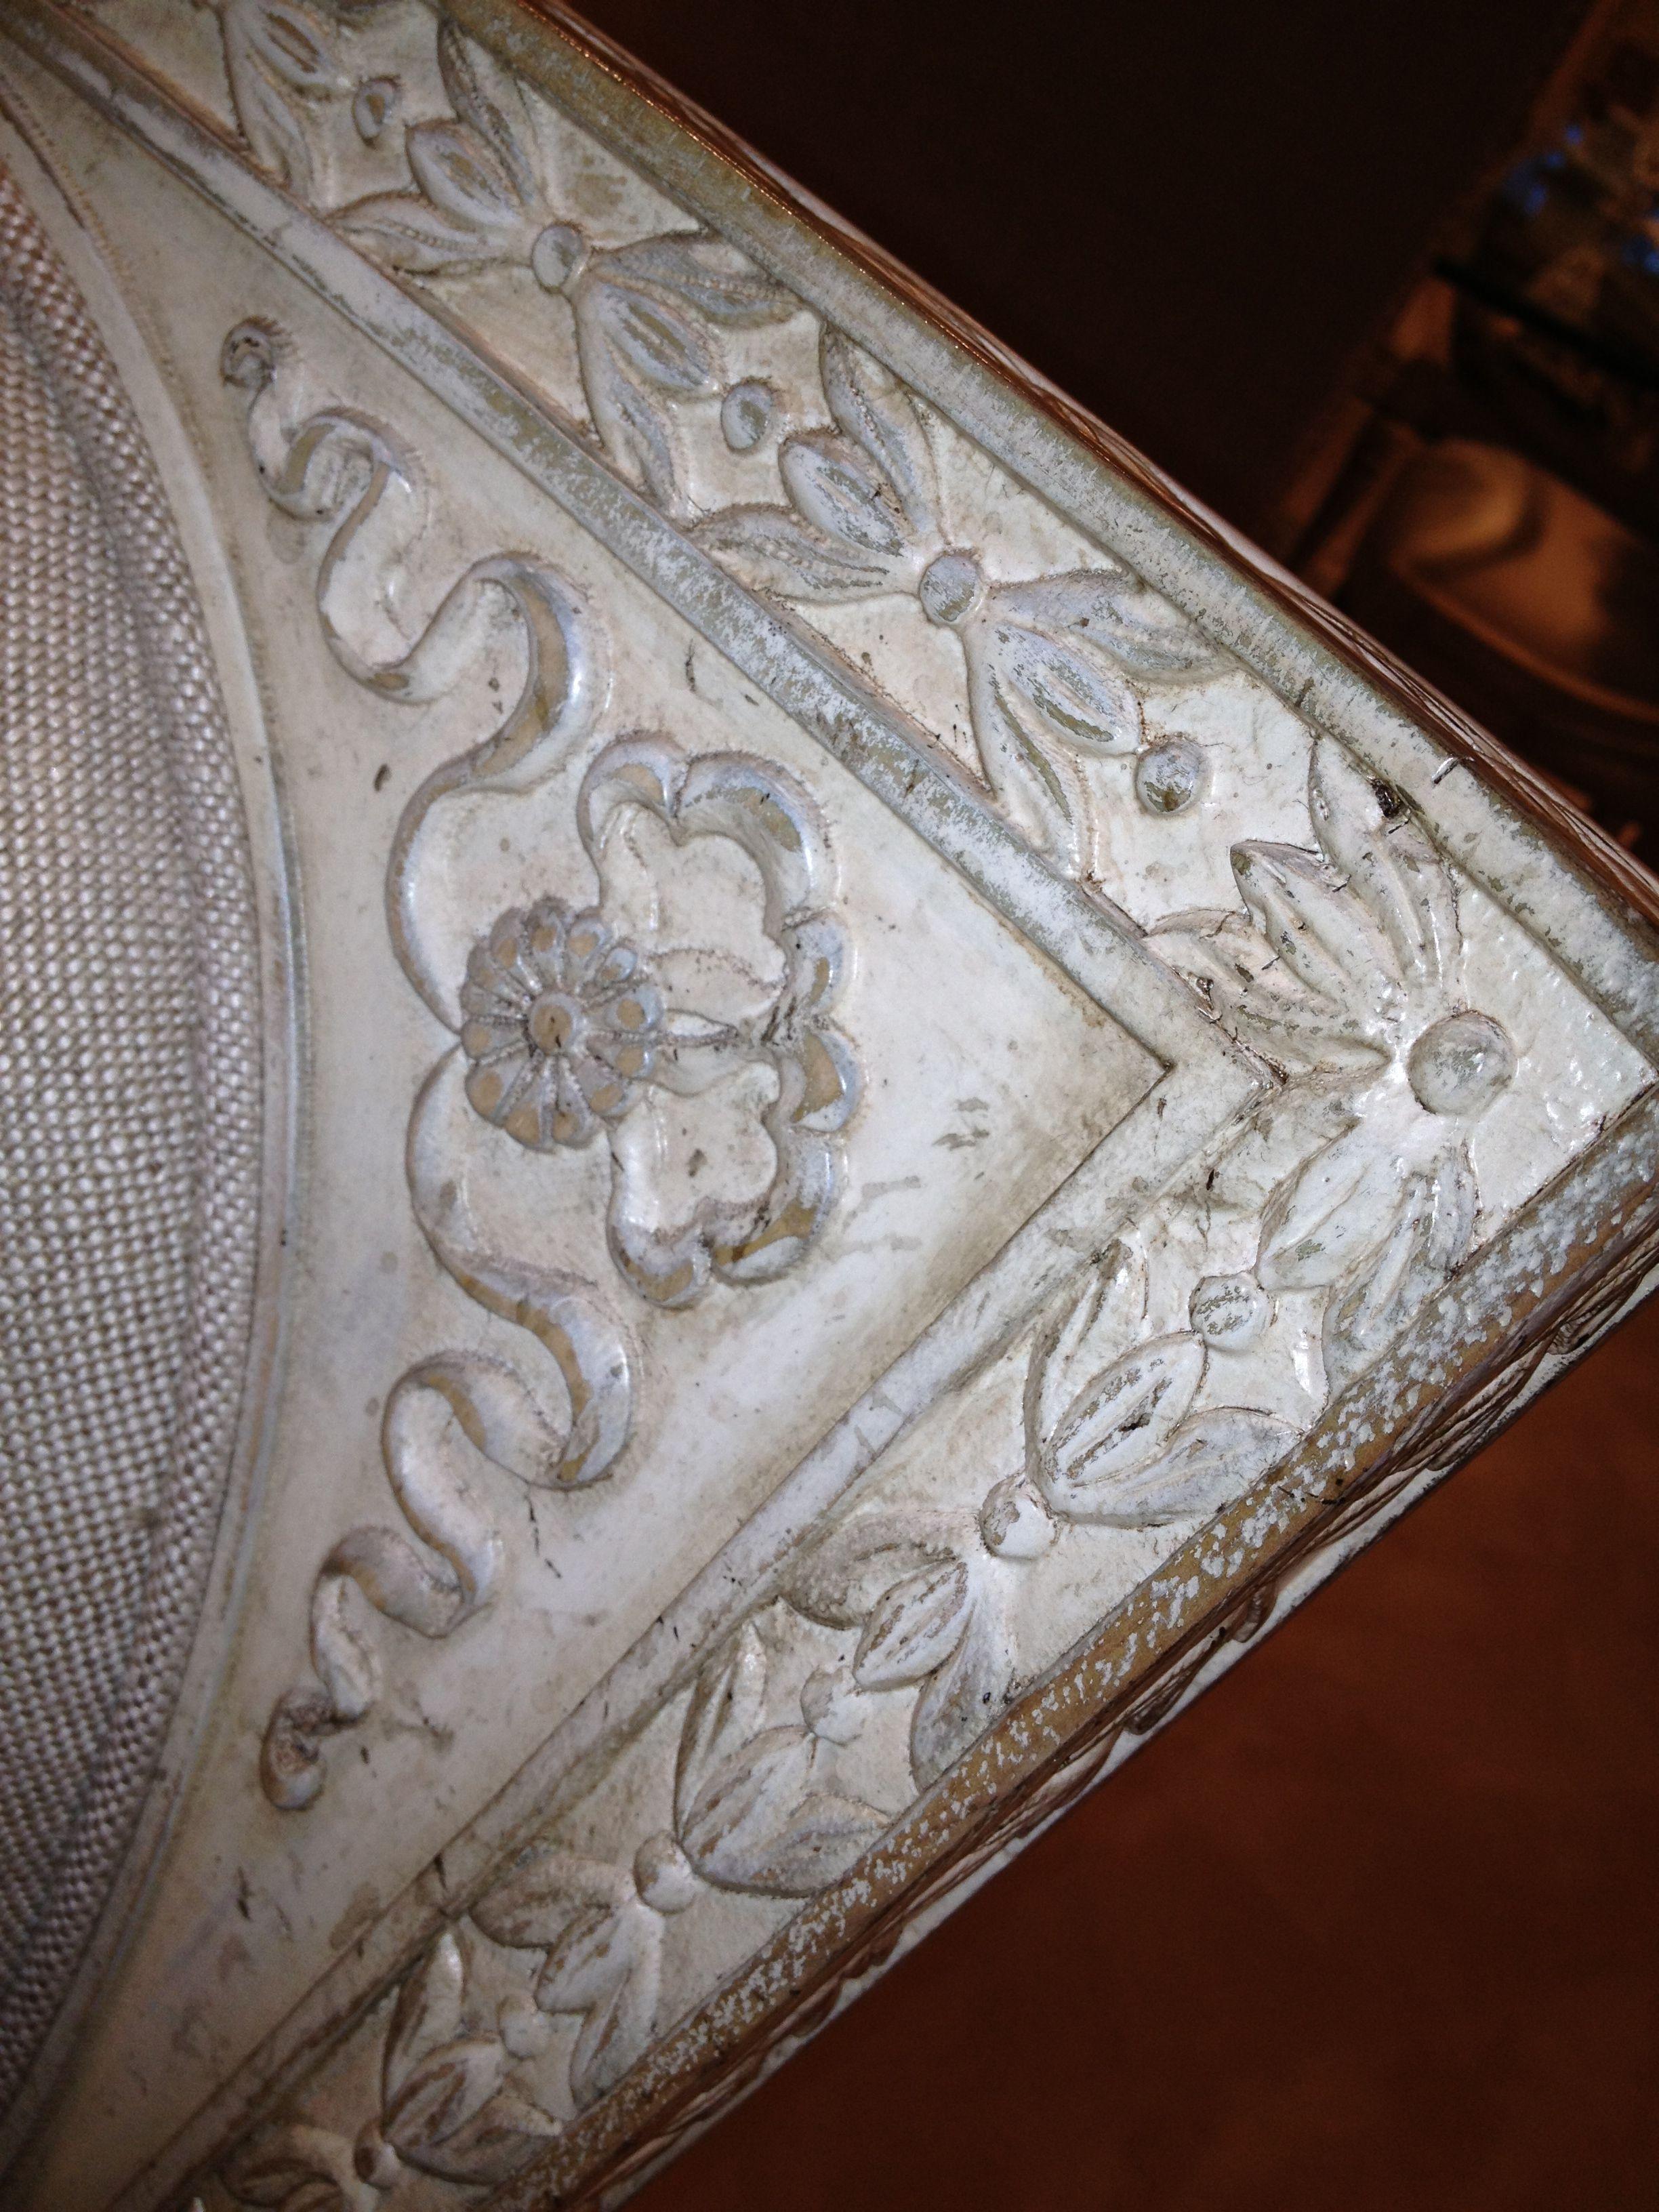 american drew jessica mcclintock collection detail - Jessica Mcclintock Furniture